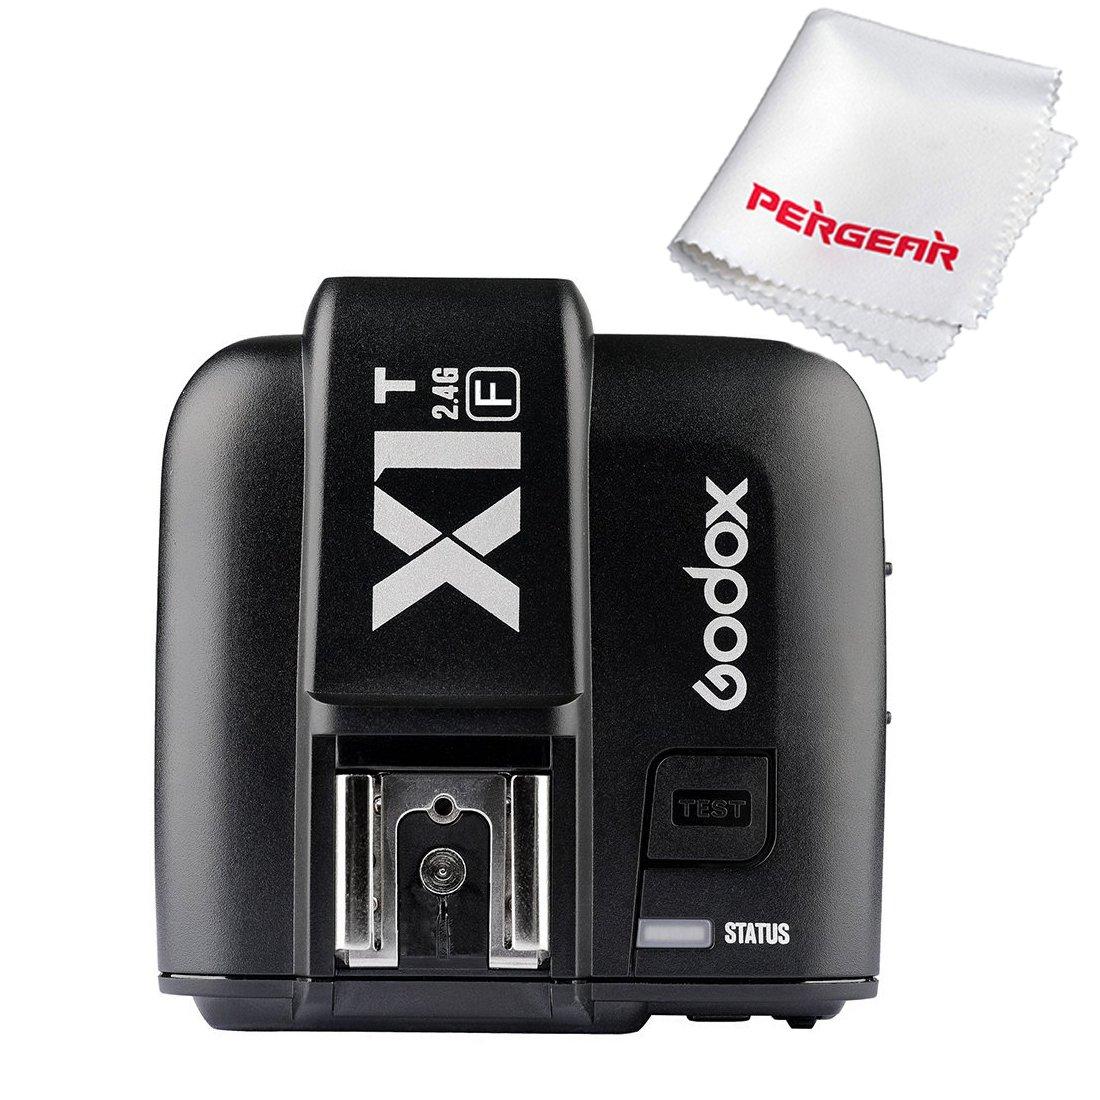 Godox X1T-F Trigger for Fuji Fujifilm Cameras TTL 1/8000s HSS 2.4G Wireless Transmitter 32 Channels - With PERGEAR Cleaning Cloth